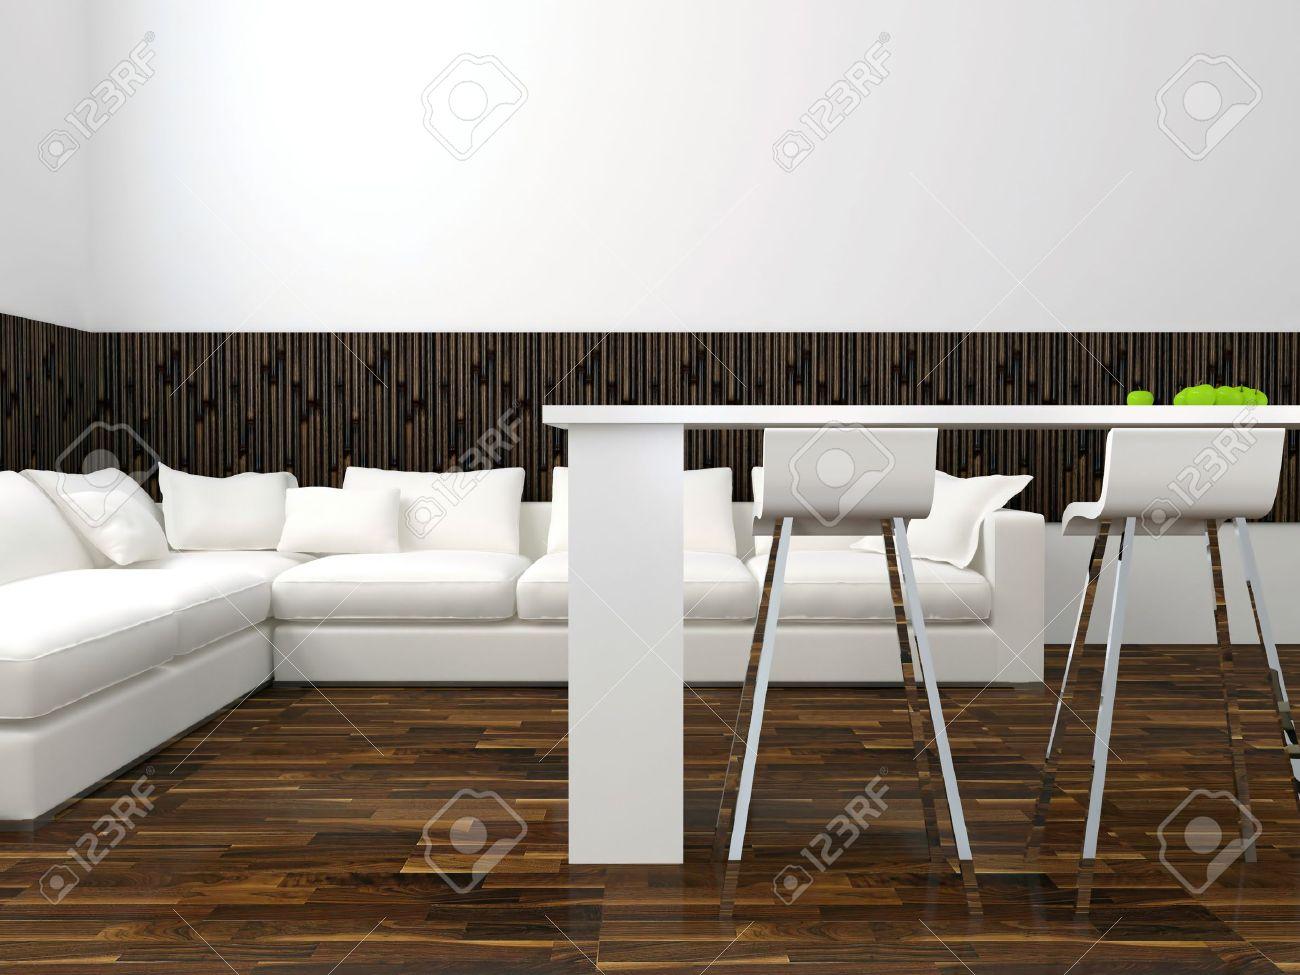 Modern White Living Room Furniture Interior Design Of Modern White Living Room With Big White Sofa